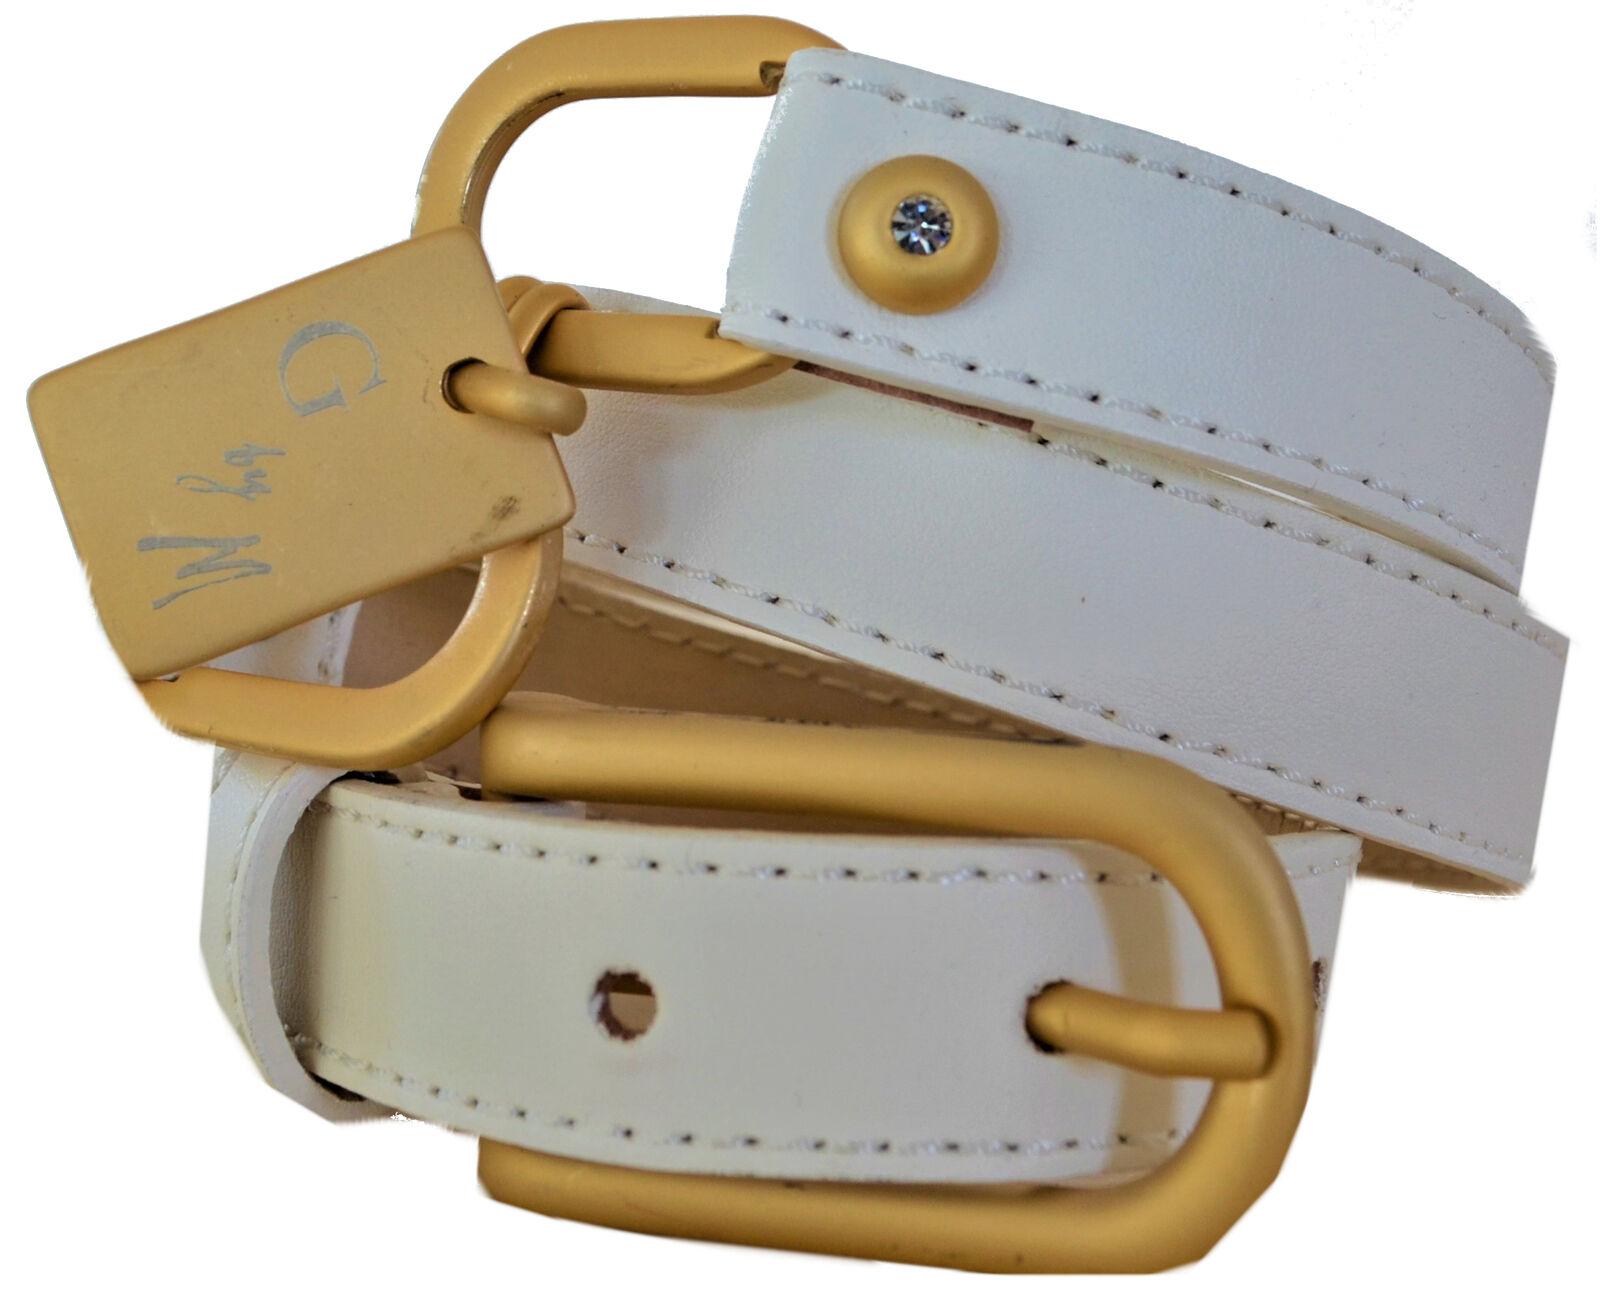 Cintura Guess women Bianco Belt Woman White Art1531 M